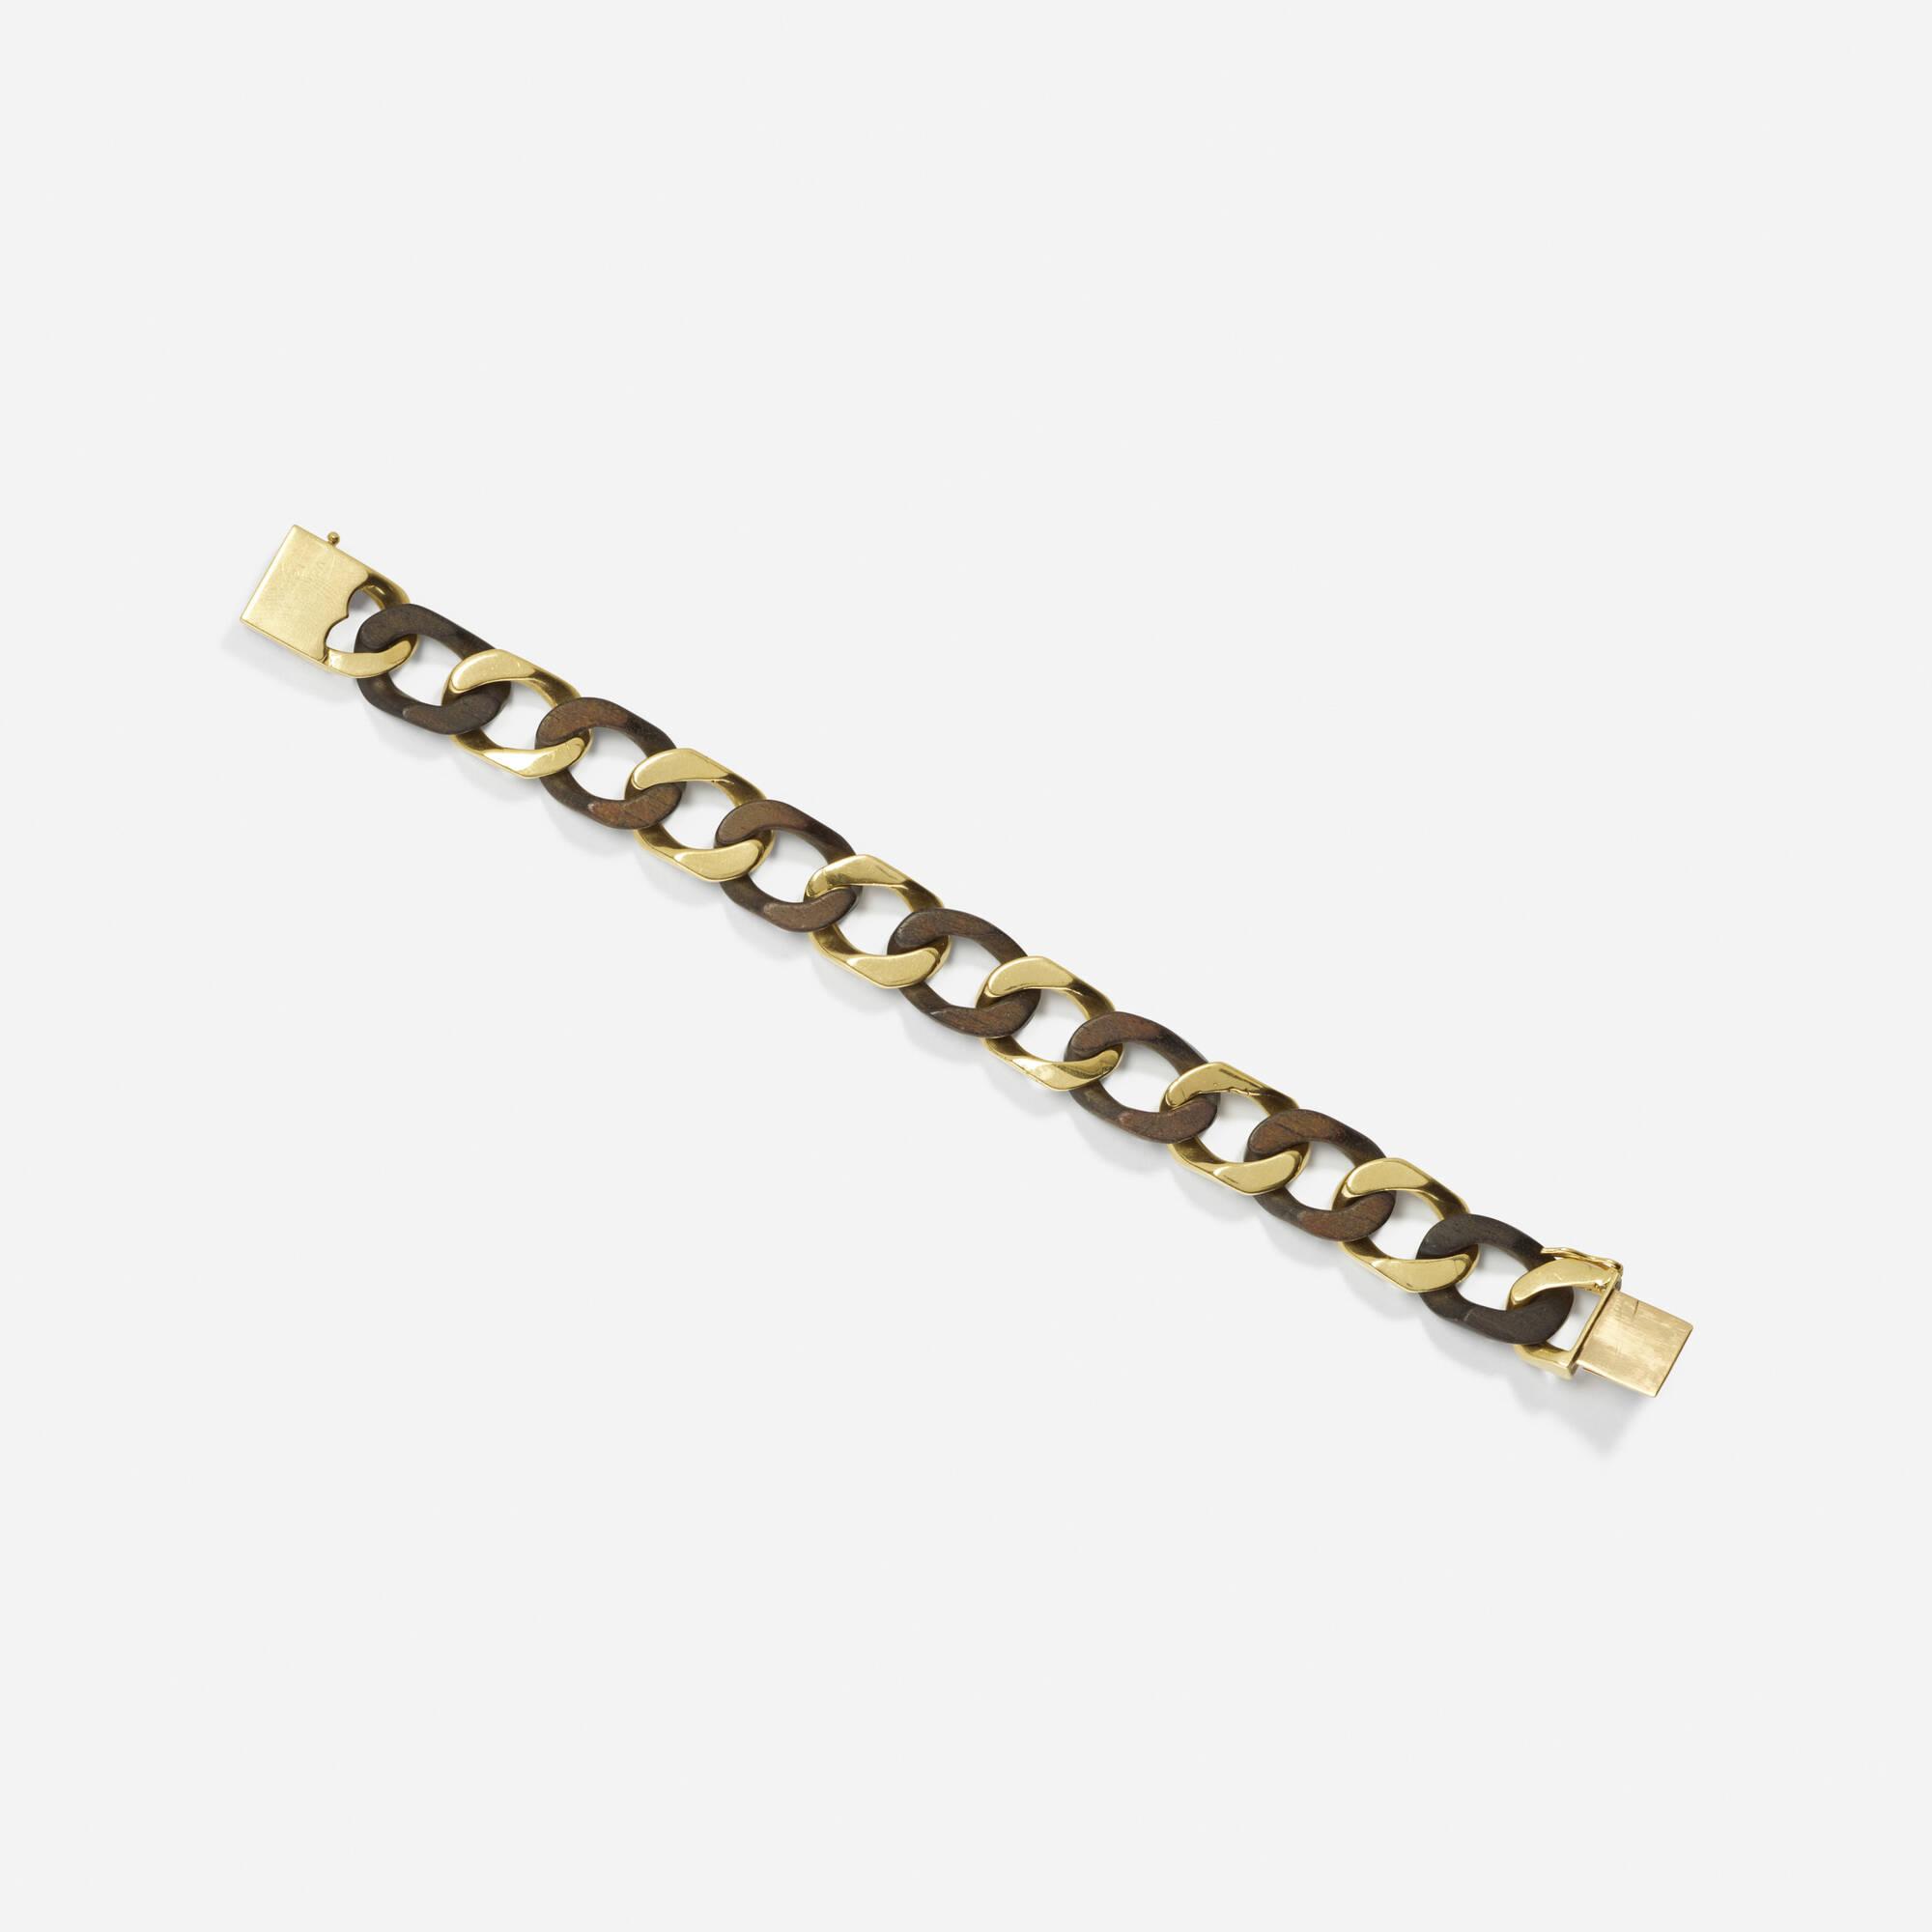 159: Van Cleef & Arpels / A gold and wood bracelet (1 of 1)